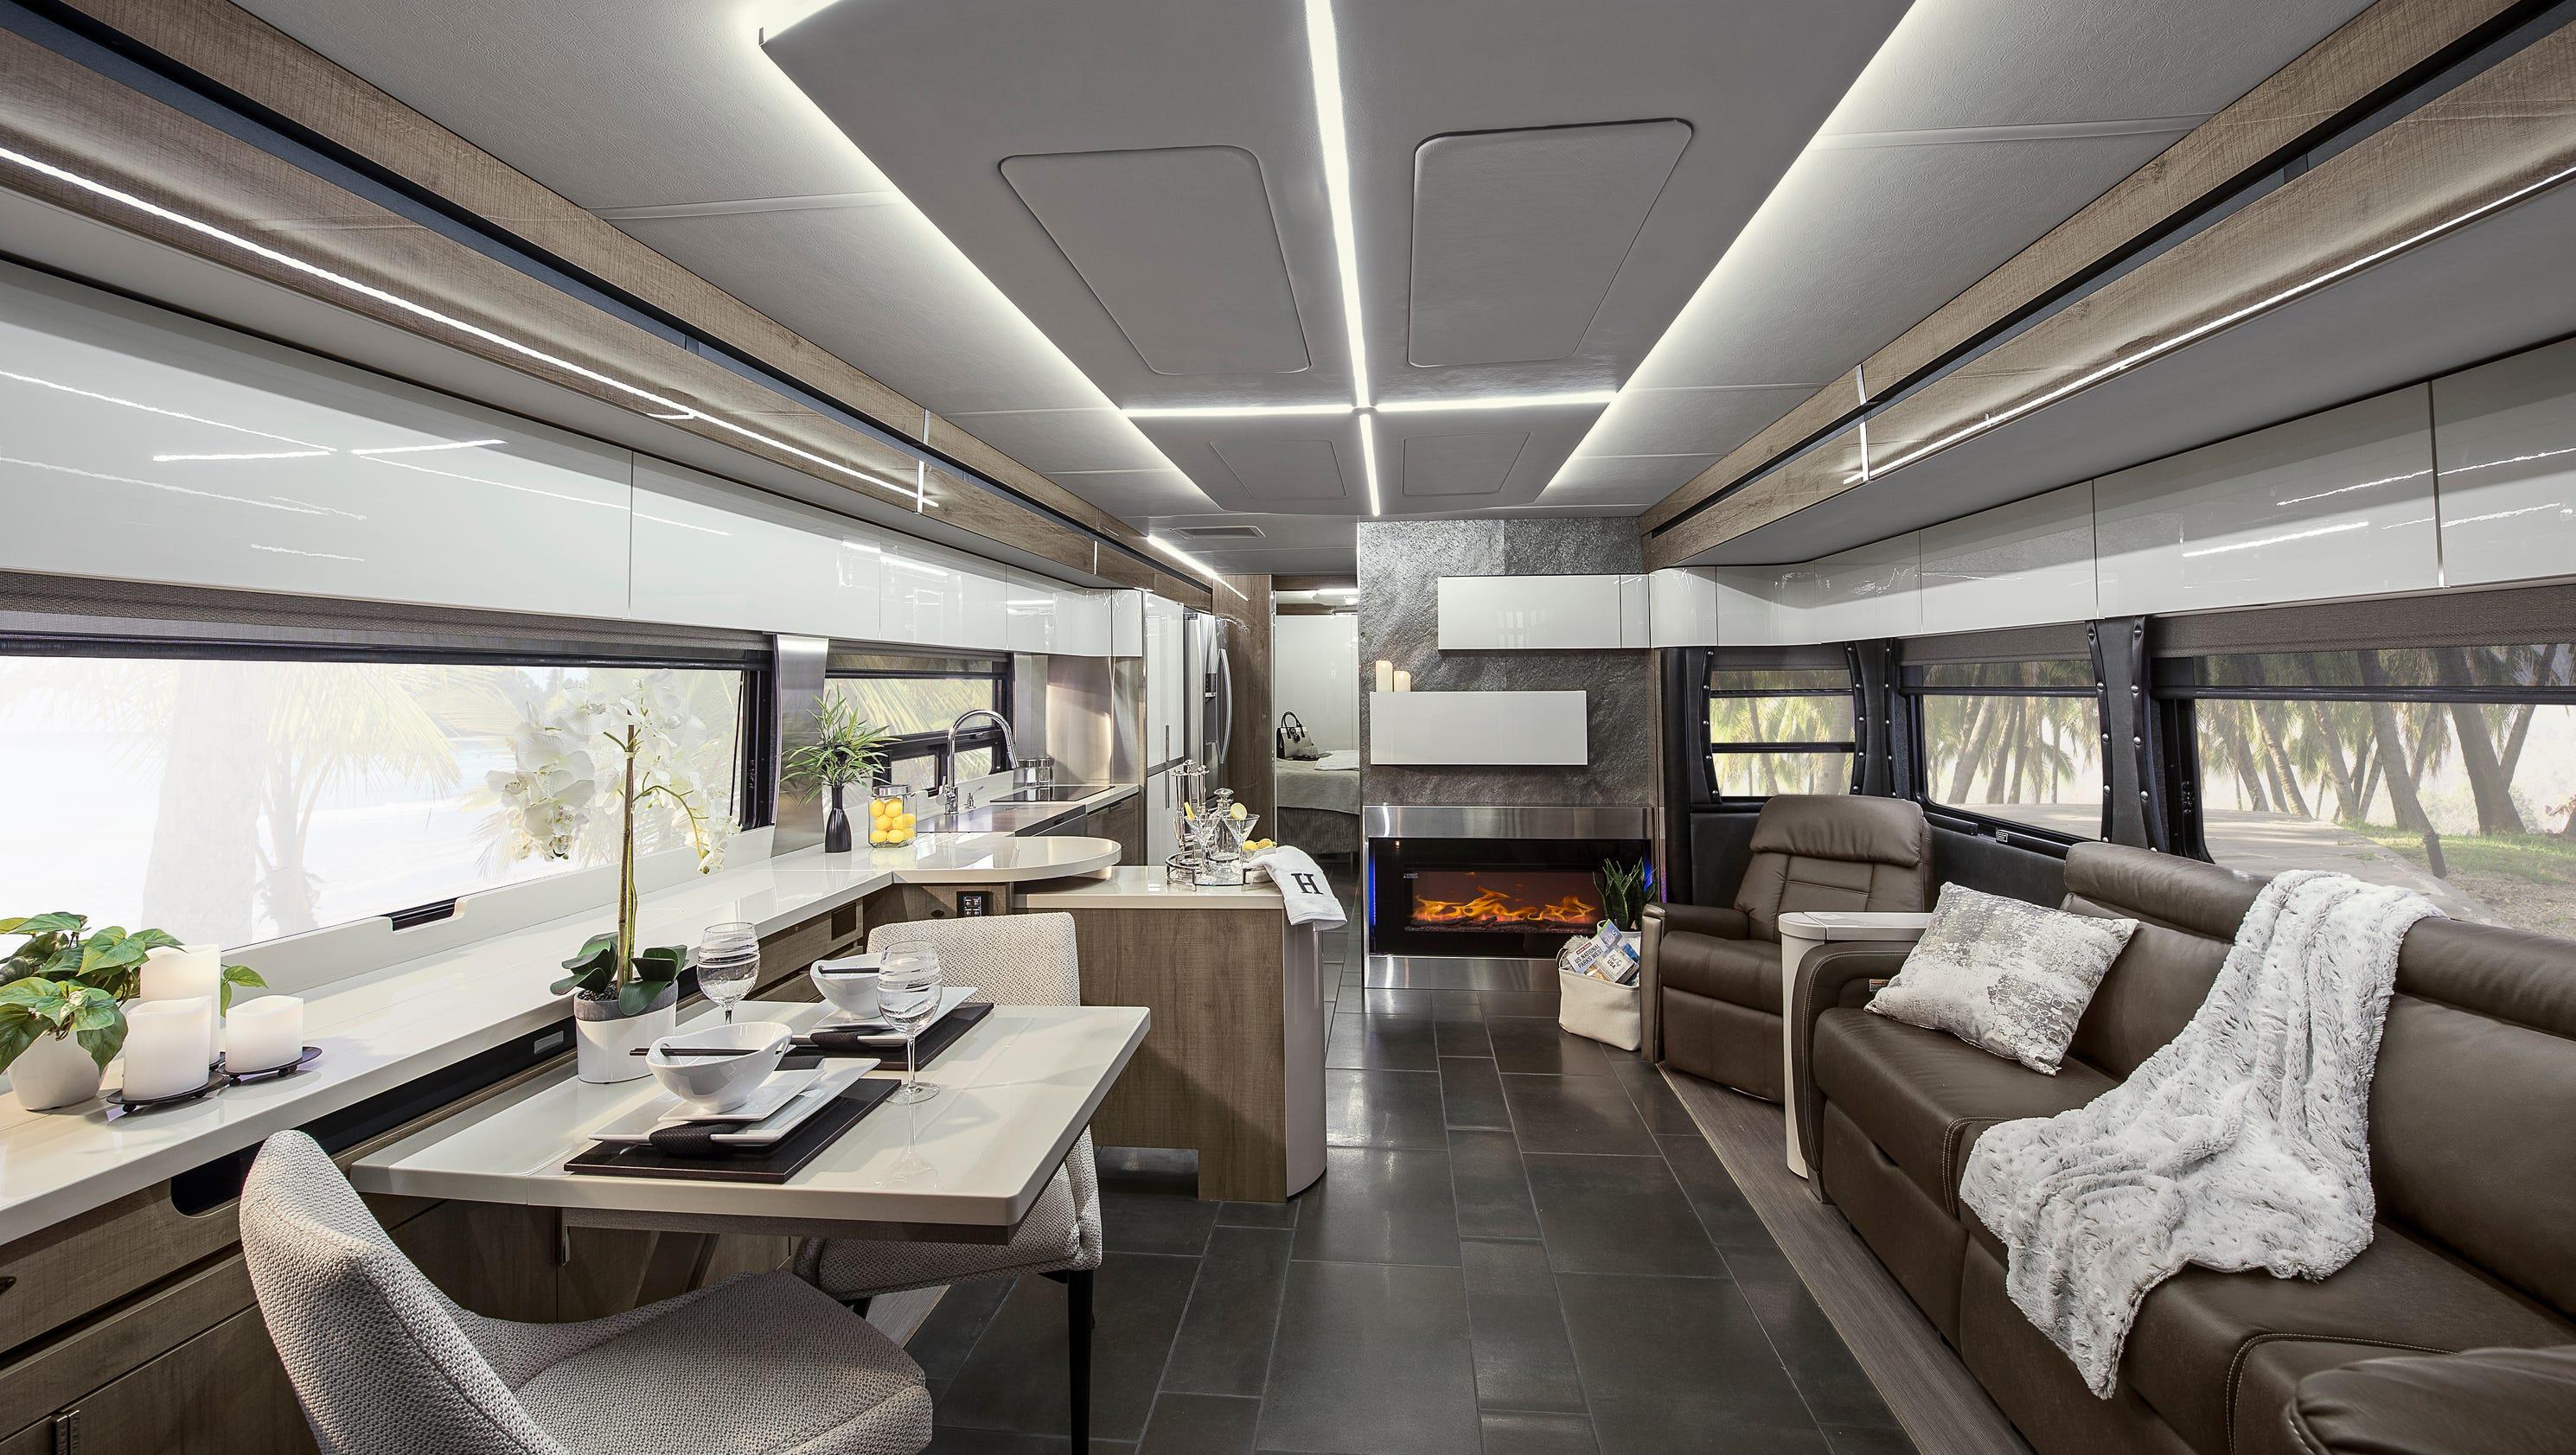 winnebago 39 s luxury horizon model named 39 rv of the year 39. Black Bedroom Furniture Sets. Home Design Ideas